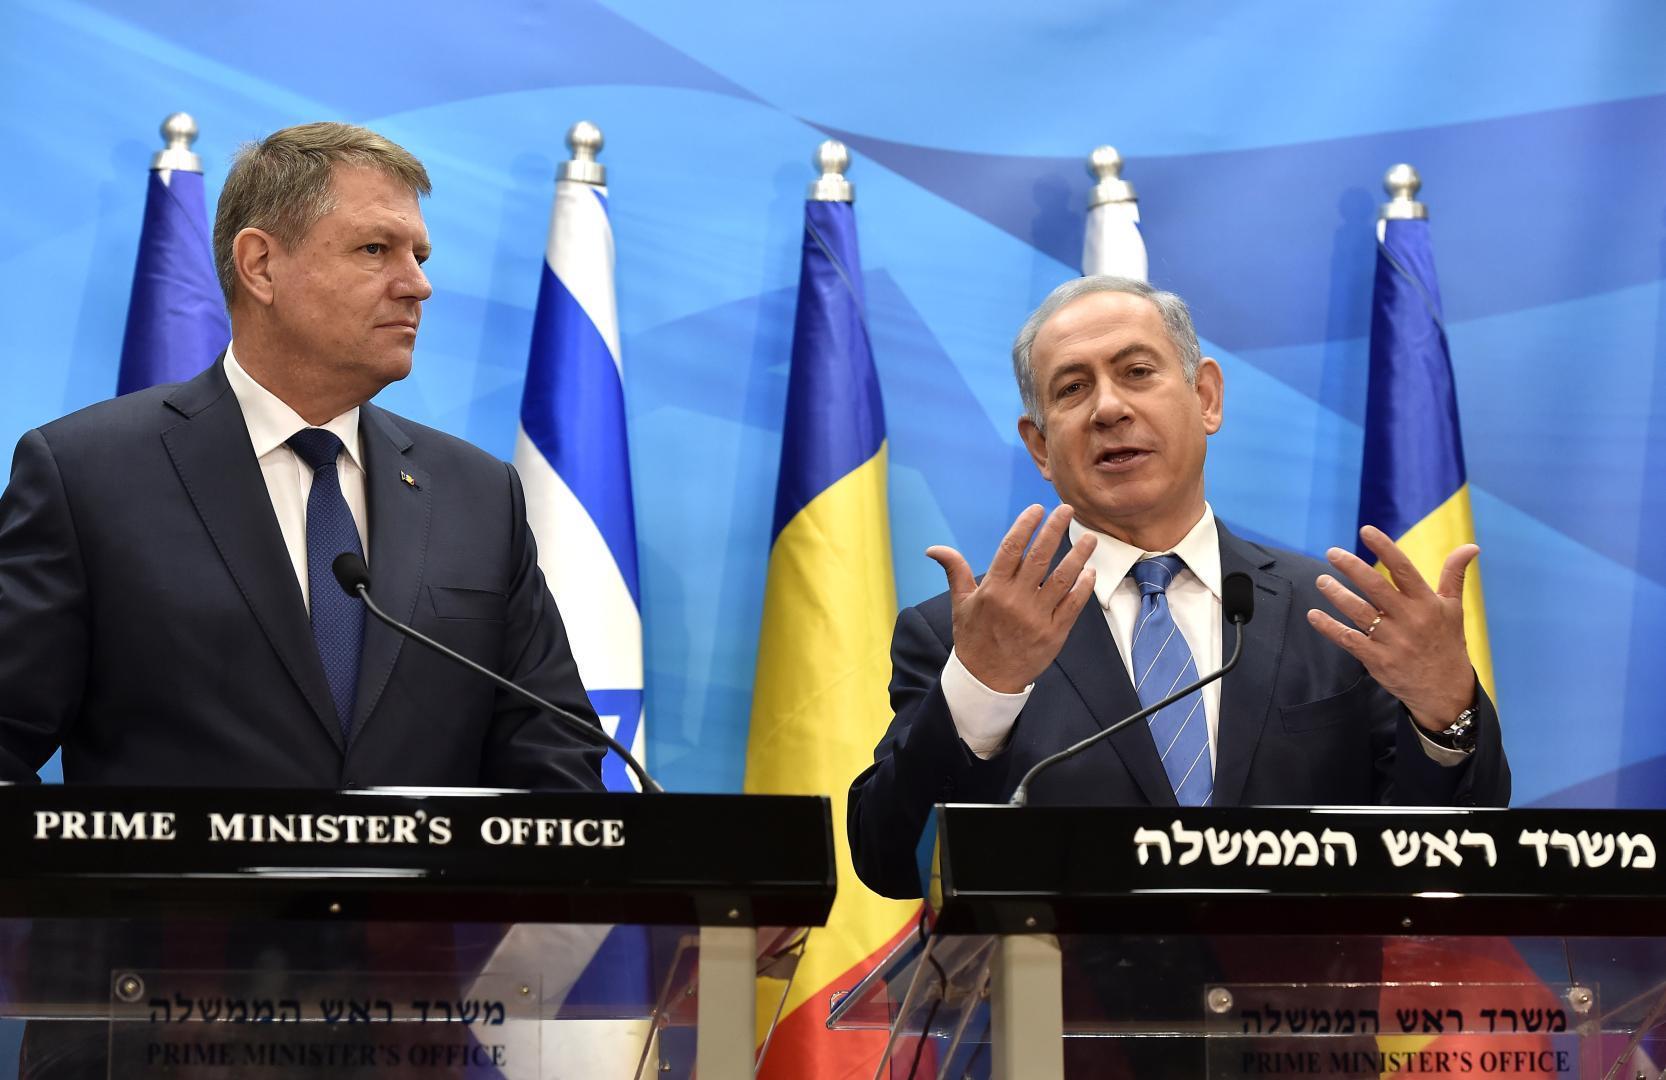 Președintele român Klaus Iohannis refuză momentan mutarea ambasadei statului român la Ierusalim